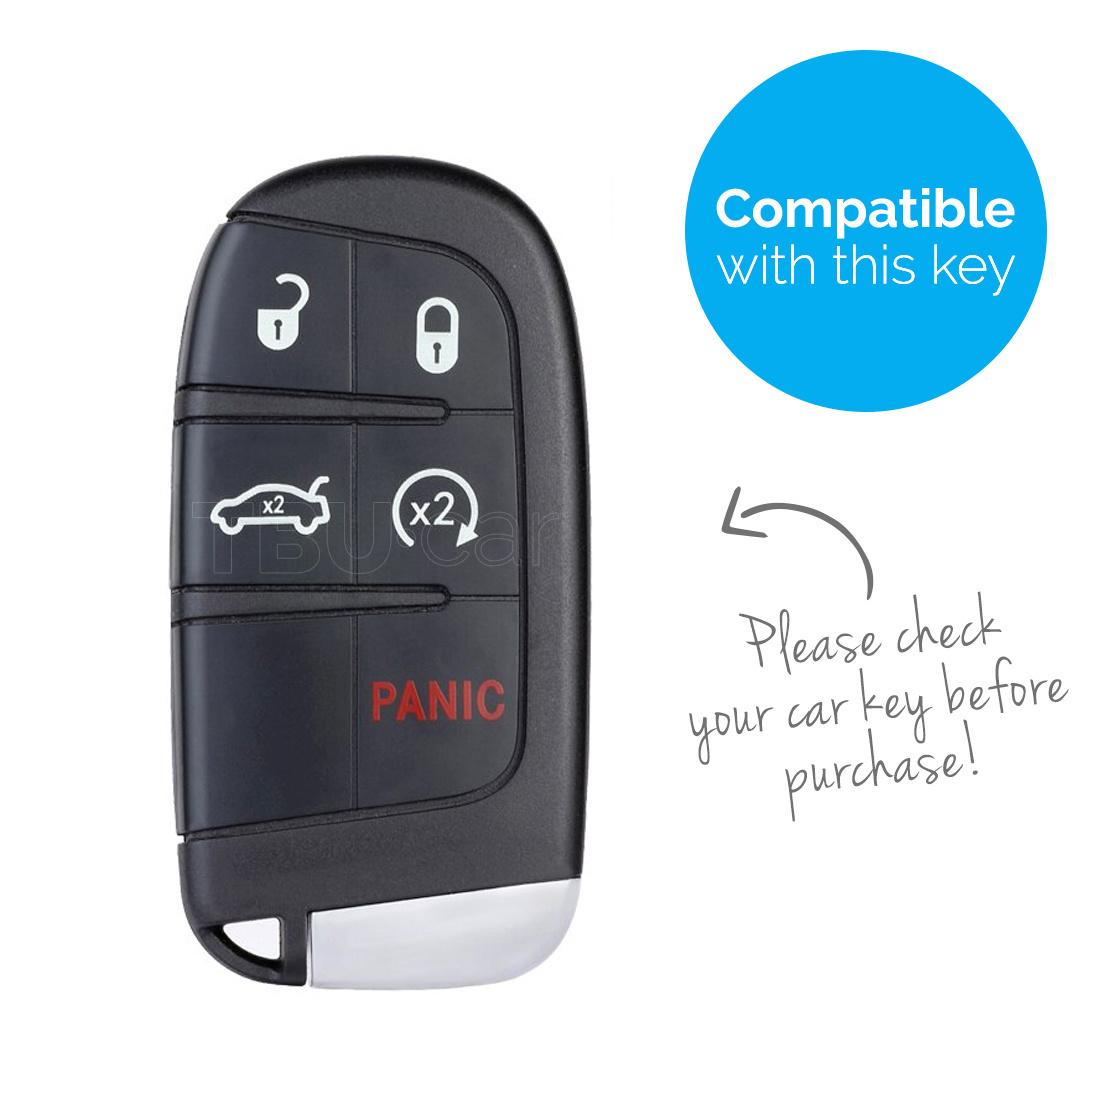 TBU car TBU car Autoschlüssel Hülle kompatibel mit Fiat 5 Tasten (Keyless Entry) - Schutzhülle aus Silikon - Auto Schlüsselhülle Cover in Schwarz